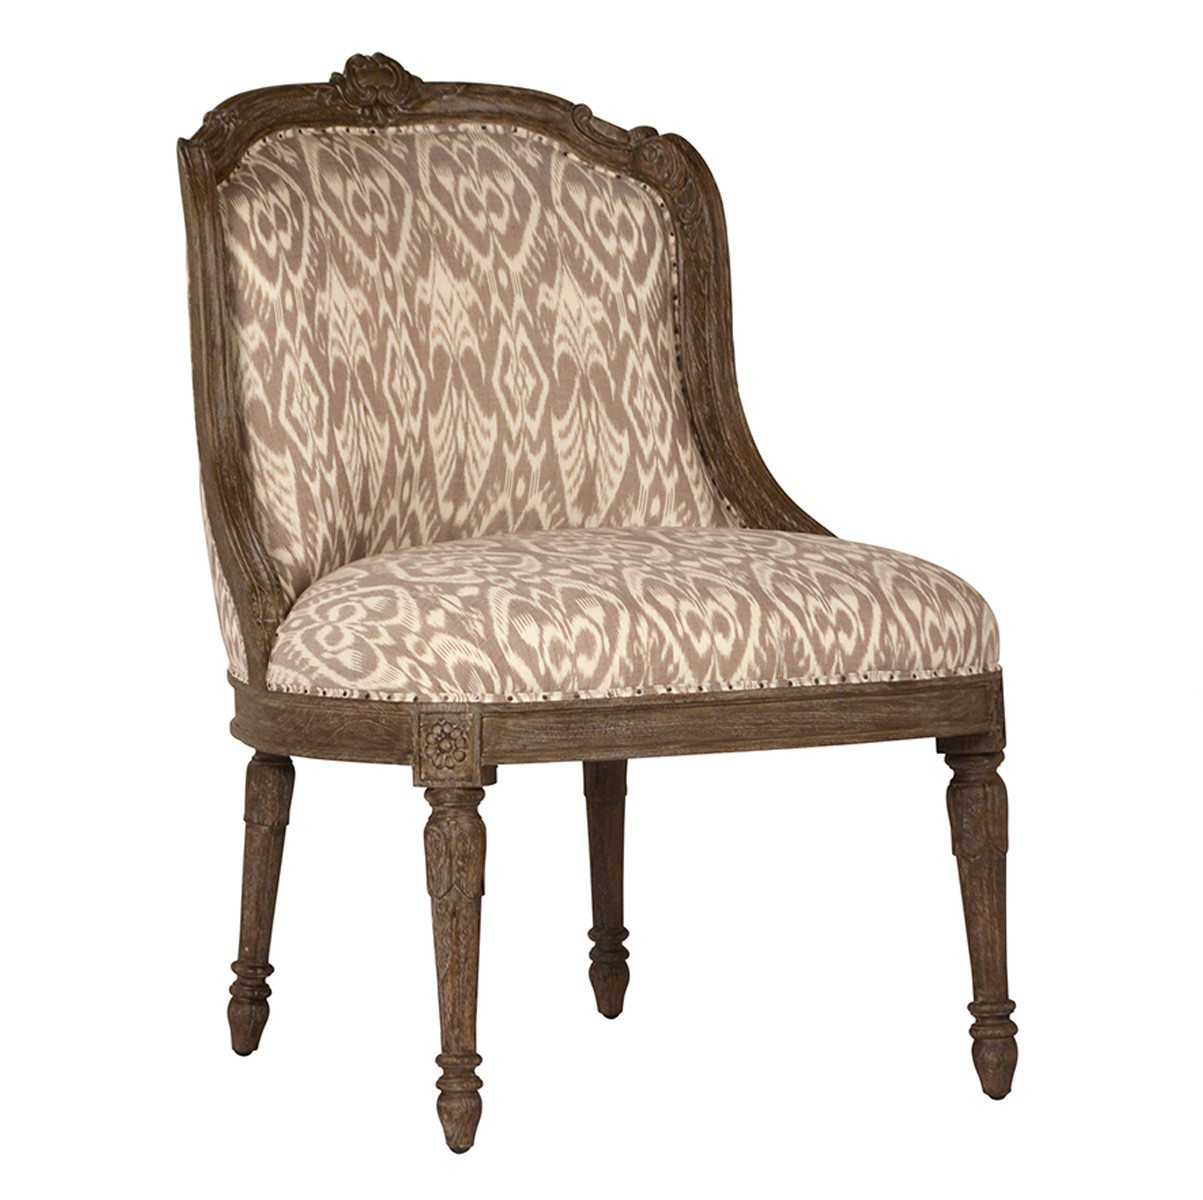 katia-chair-shopceladon-com